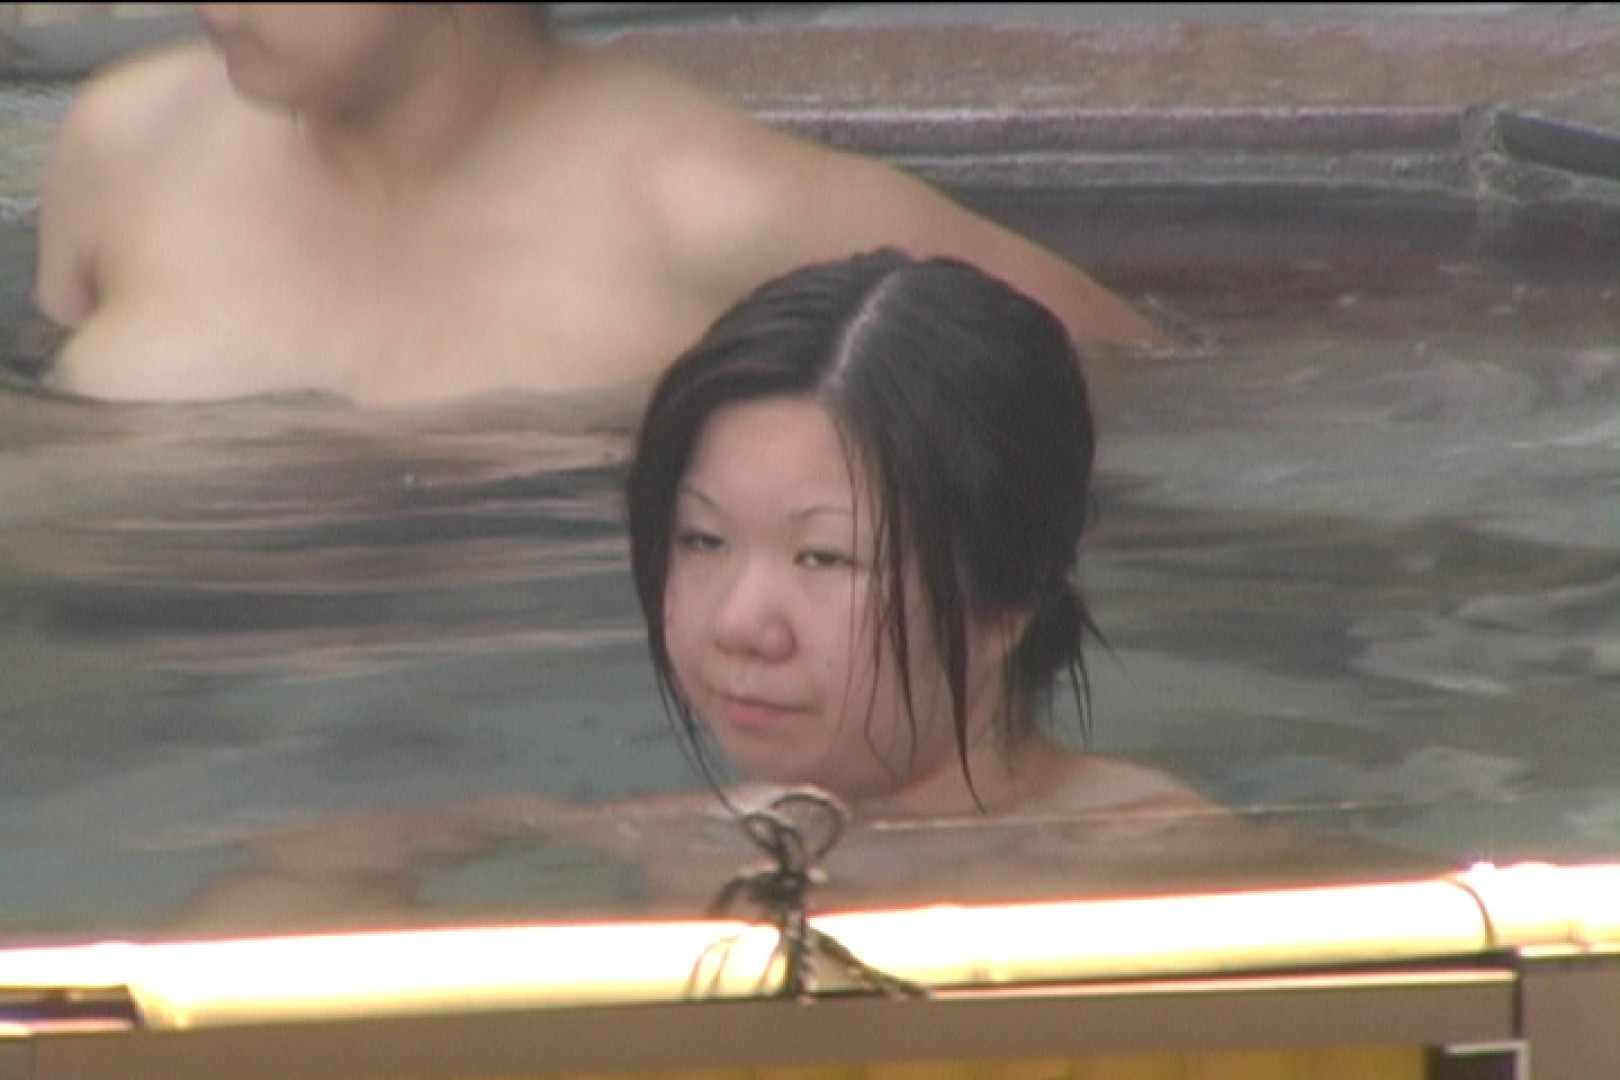 Aquaな露天風呂Vol.527 0  88連発 70